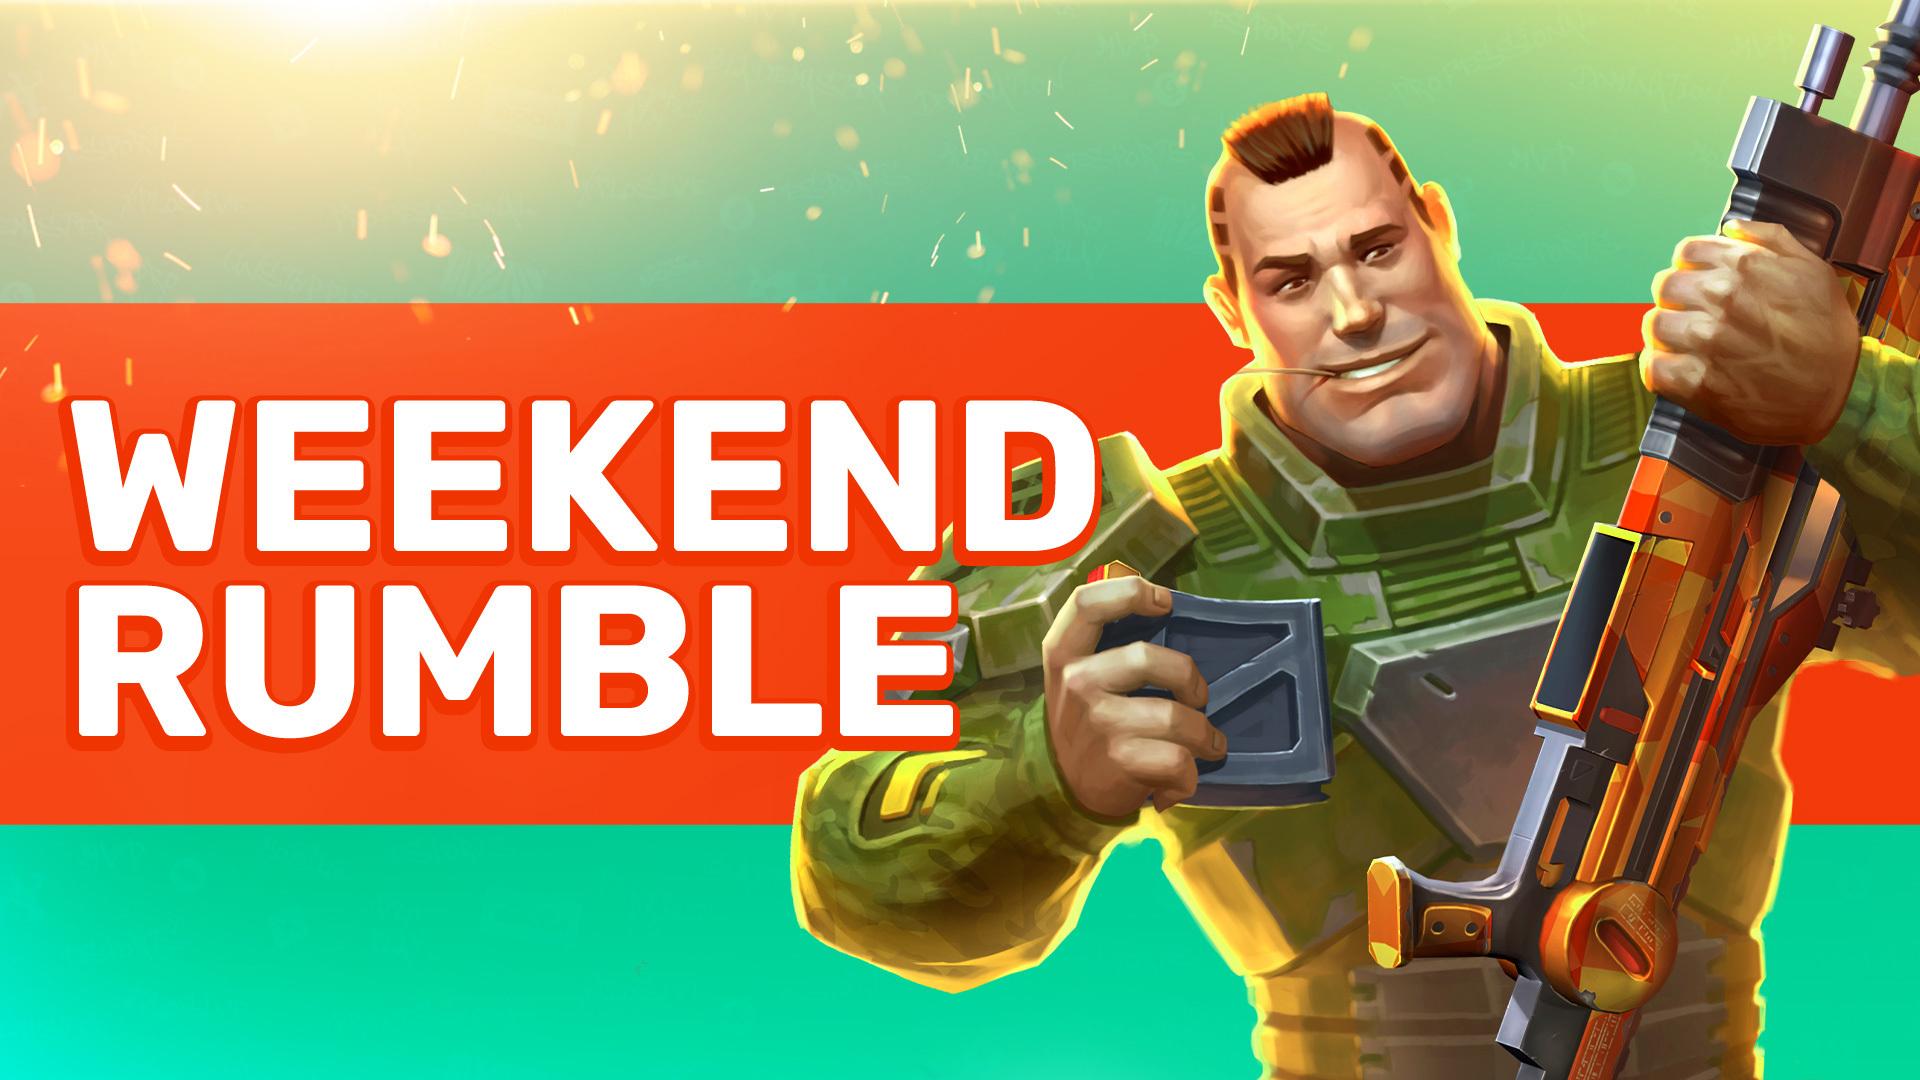 60ccd601ac051_WeekendRumble_header_1920x1080